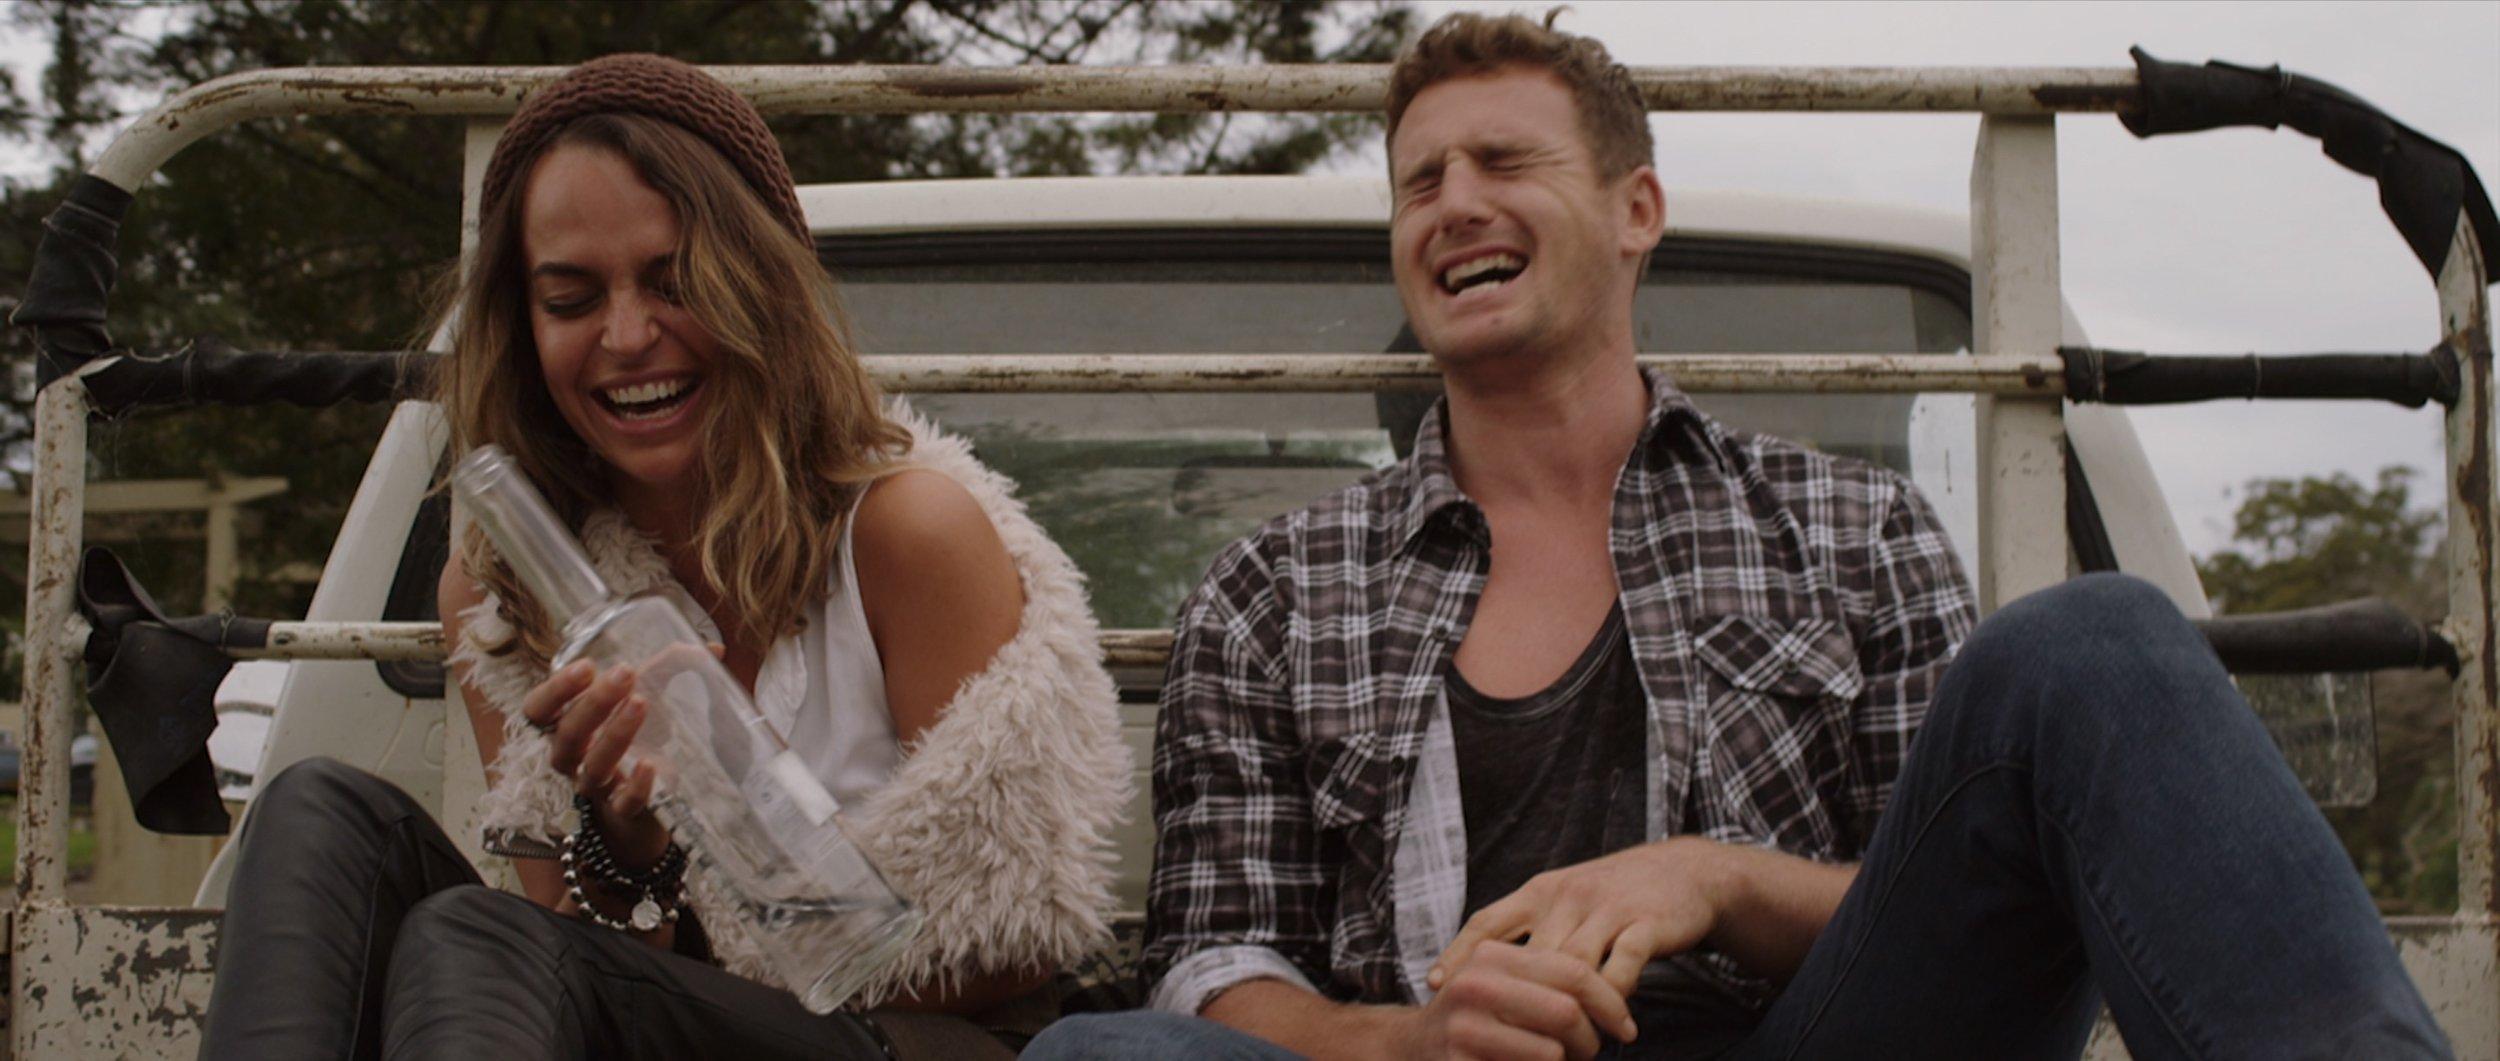 Kate Halpin Director Film - A Private Matter - Bianca Bradey 3